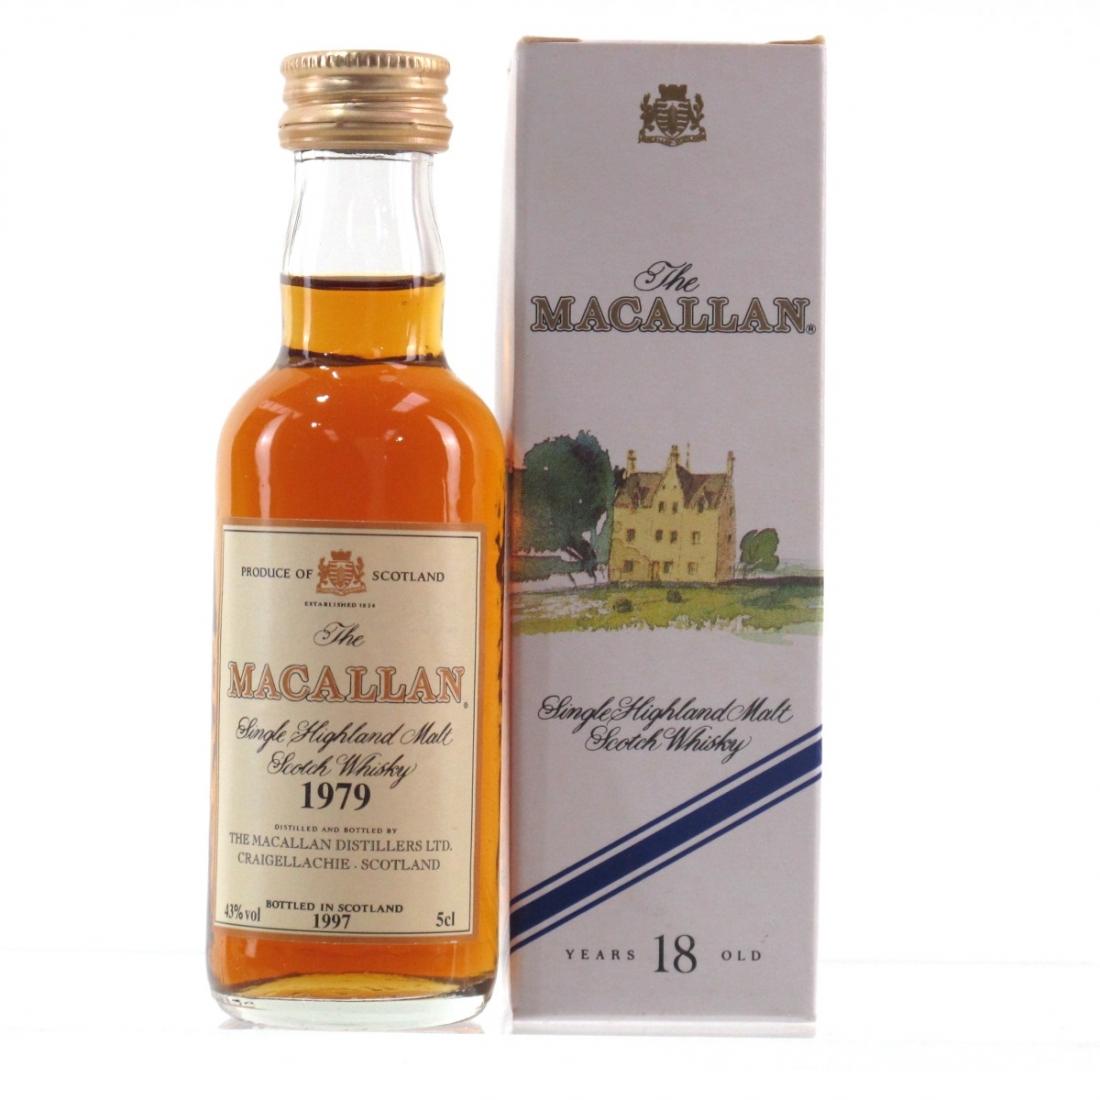 Macallan 18 Year Old 1979 Miniature 5cl